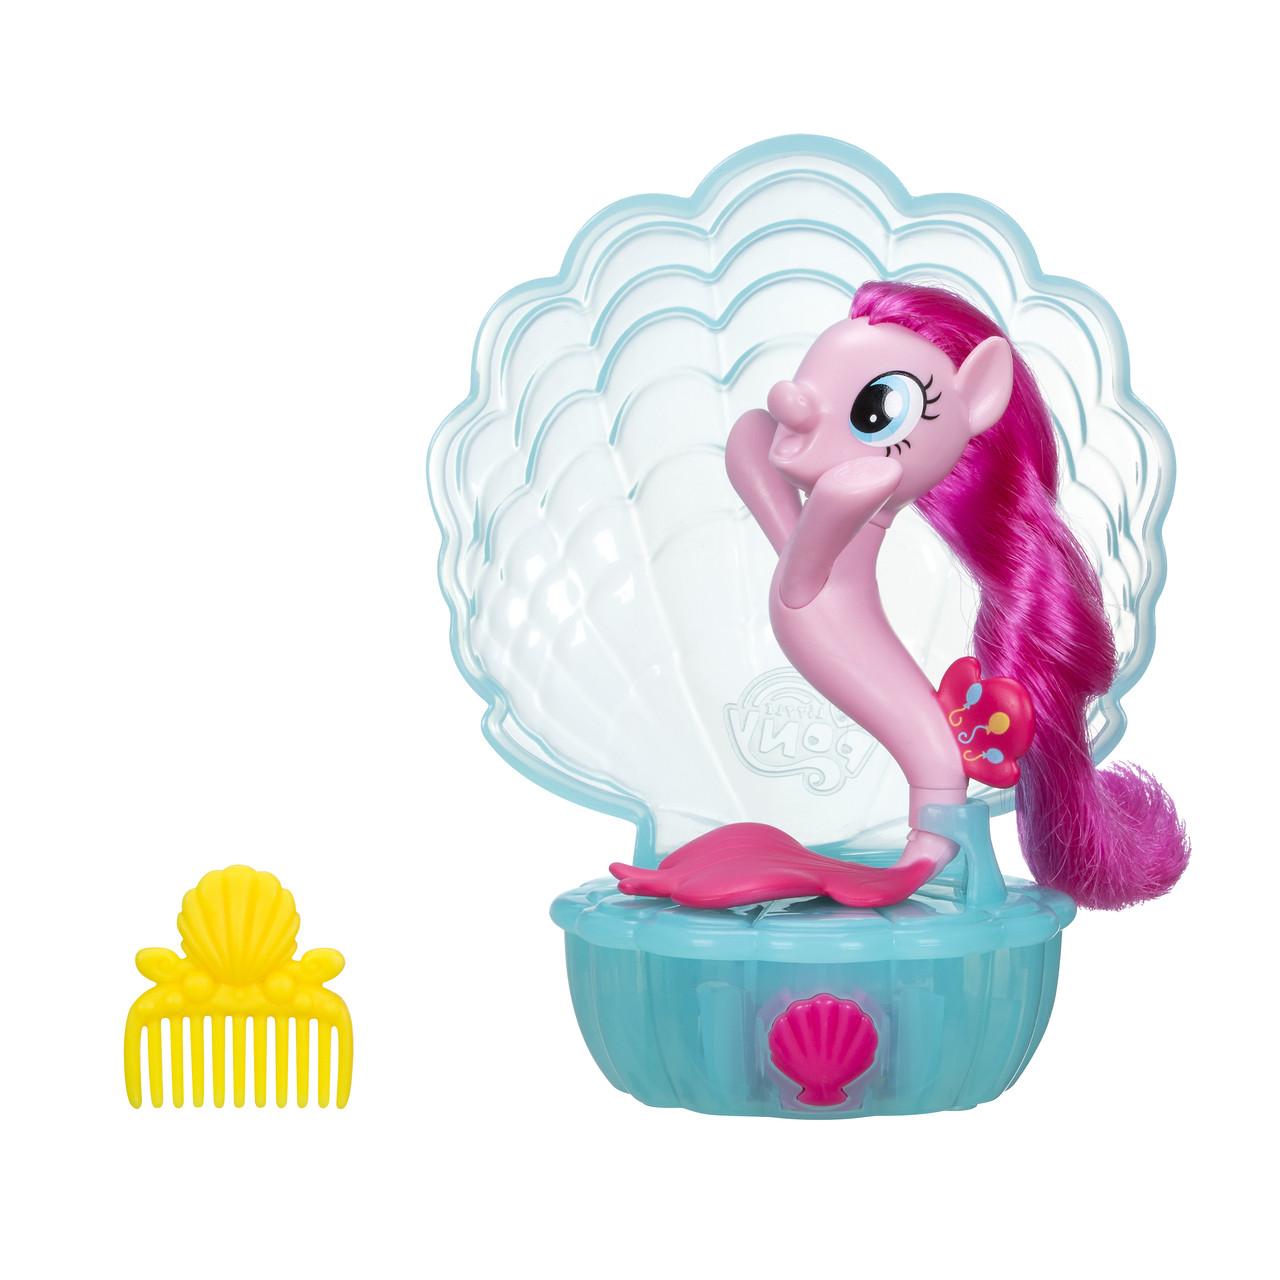 My Little Pony Pinkie Pie поні русалка, яка співає (Май Литл Пони Русалка Пинки Пай музыкальная Ракушка )